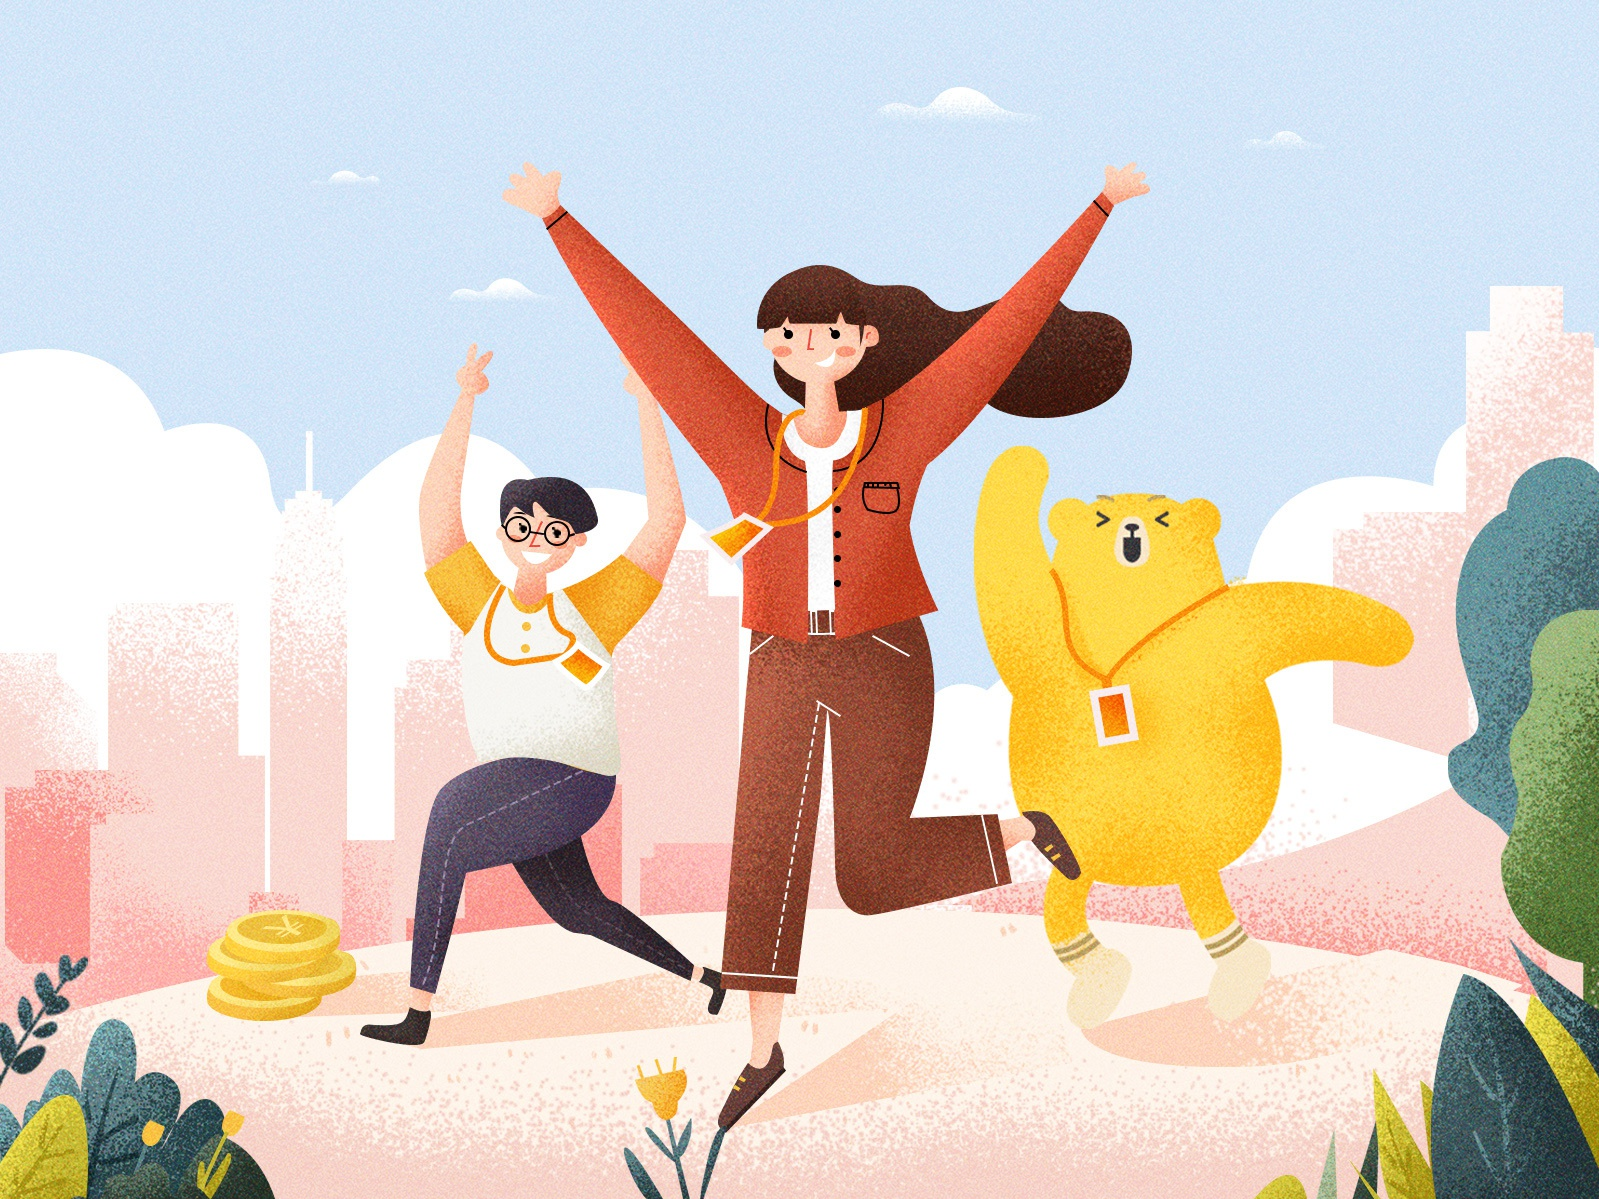 join us! bear draw web website join us company illustration design ui branding